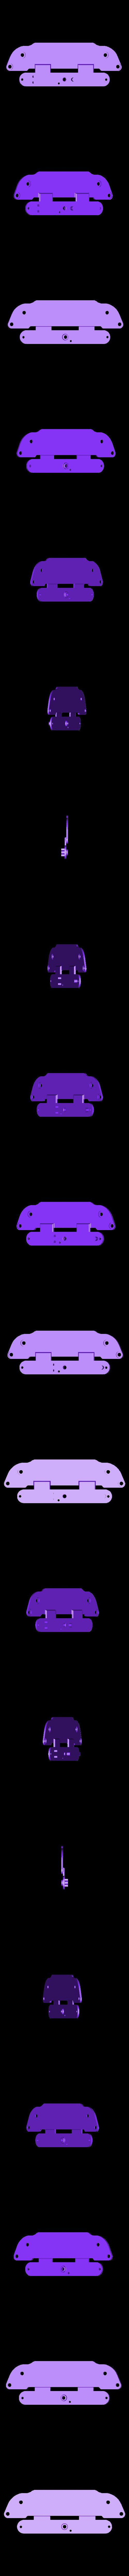 Pieza5.STL Download free STL file TSPC RACER REV LIGHTS w SIMHUB • 3D print template, danzig483